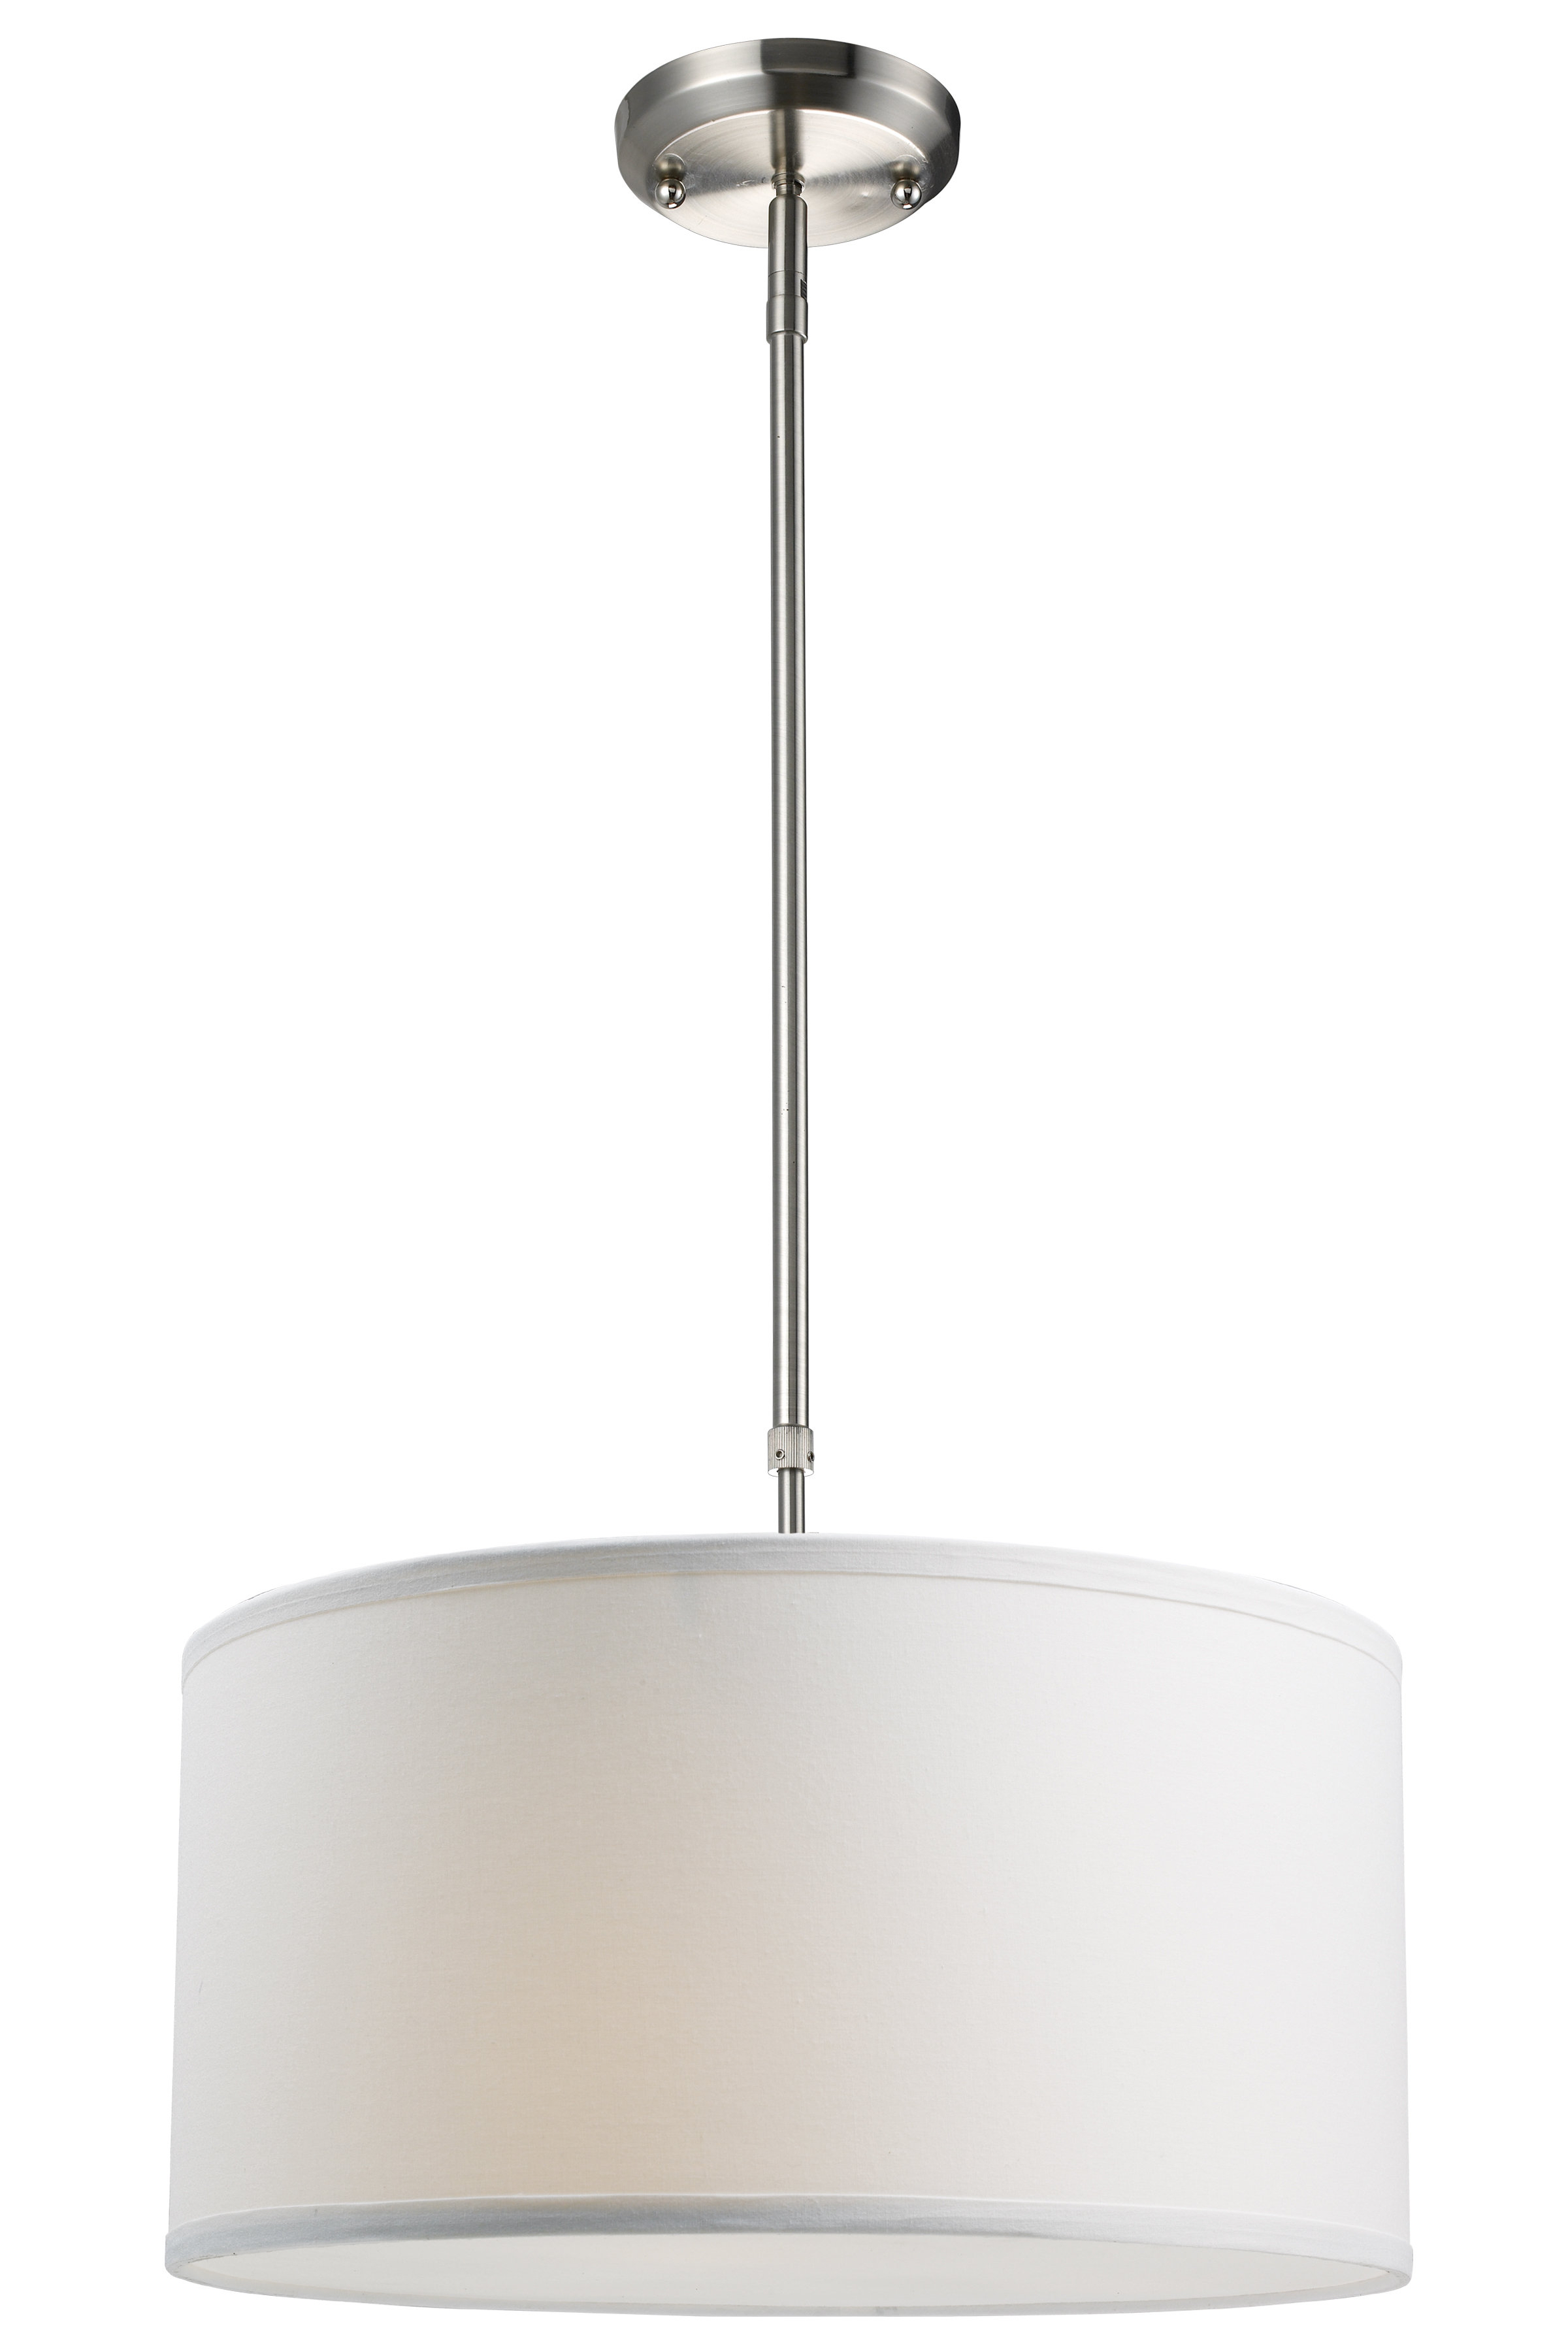 Best and Newest Radtke 3-Light Single Drum Pendants in Kasey 3-Light Single Drum Pendant